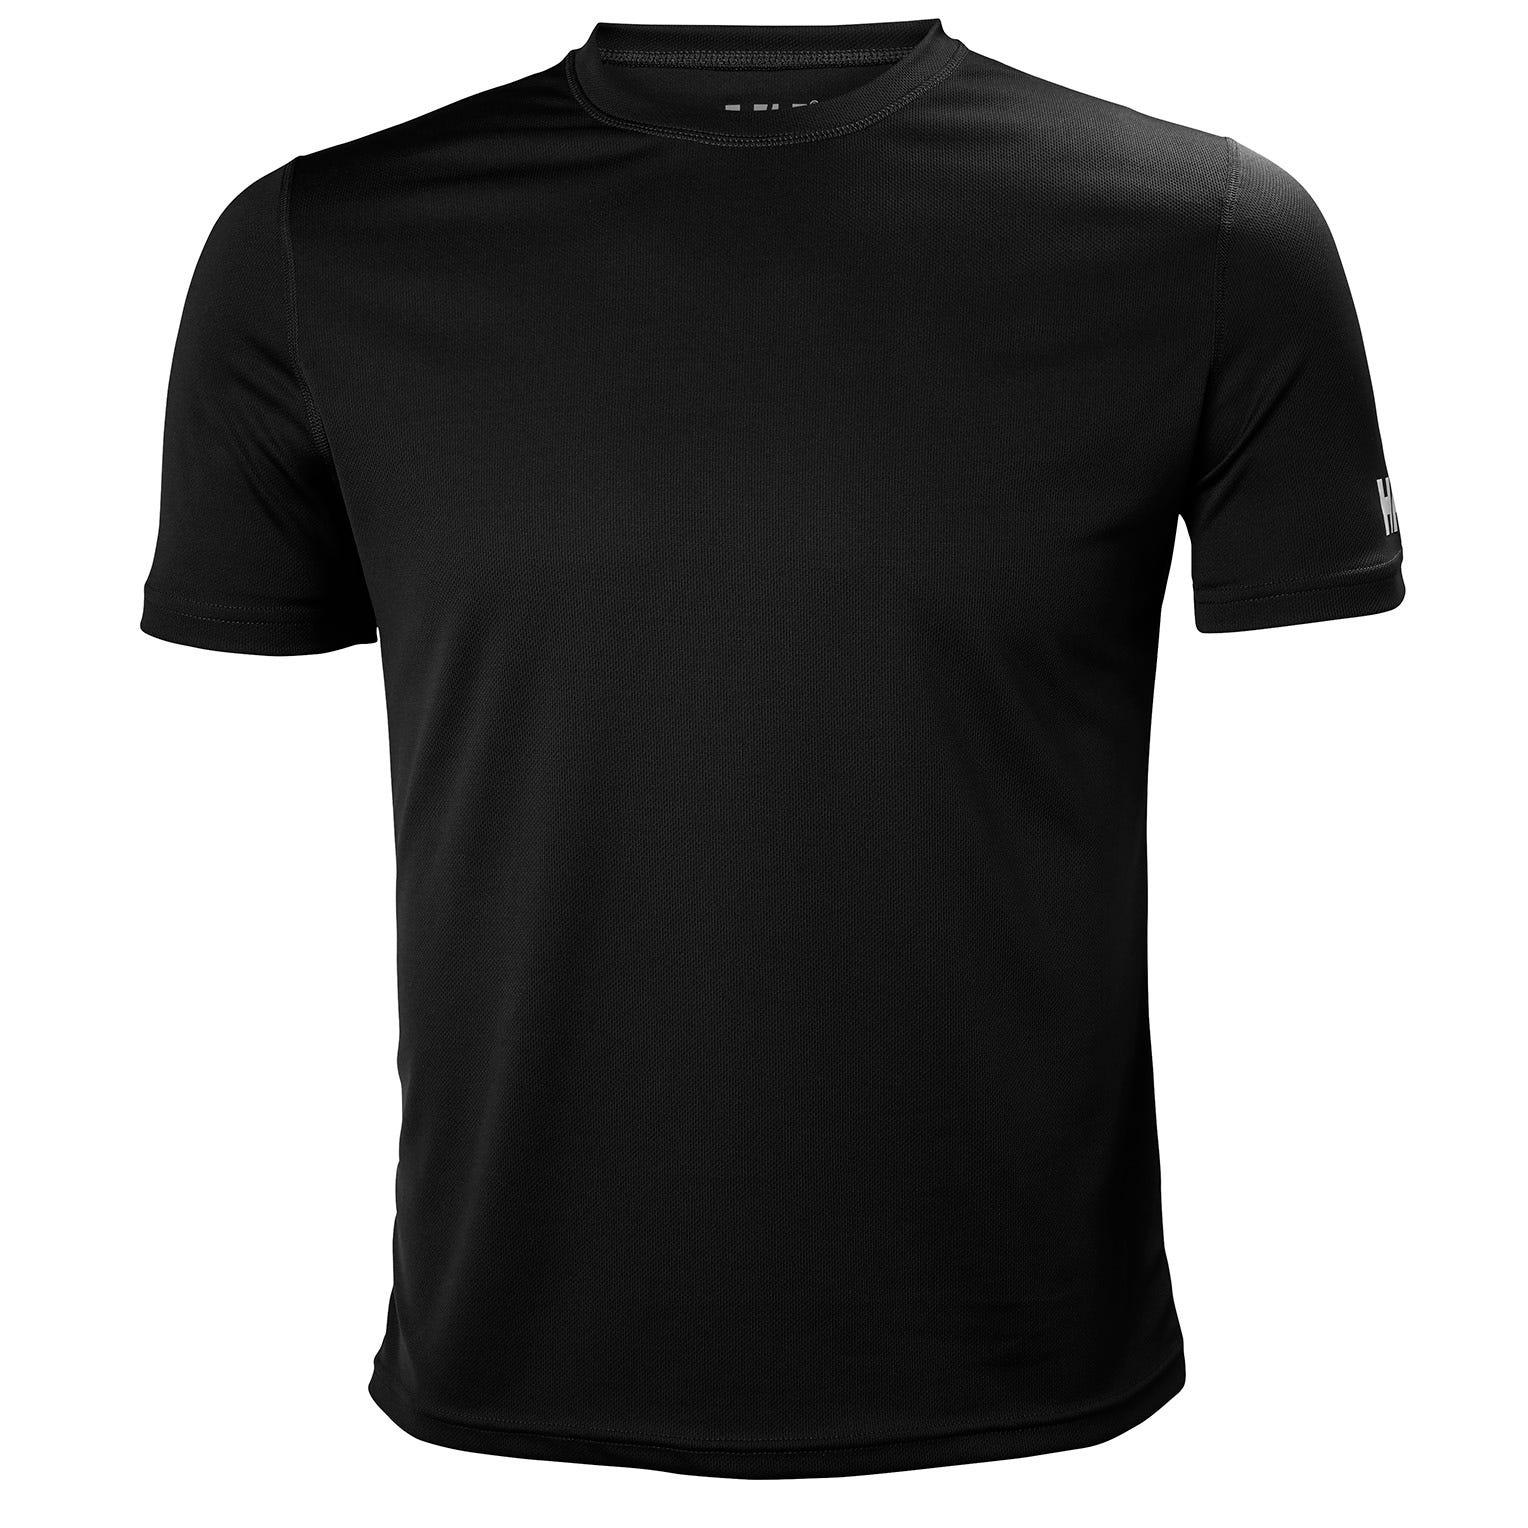 Helly Hansen Mens Tech Tshirt Baselayer Black XL